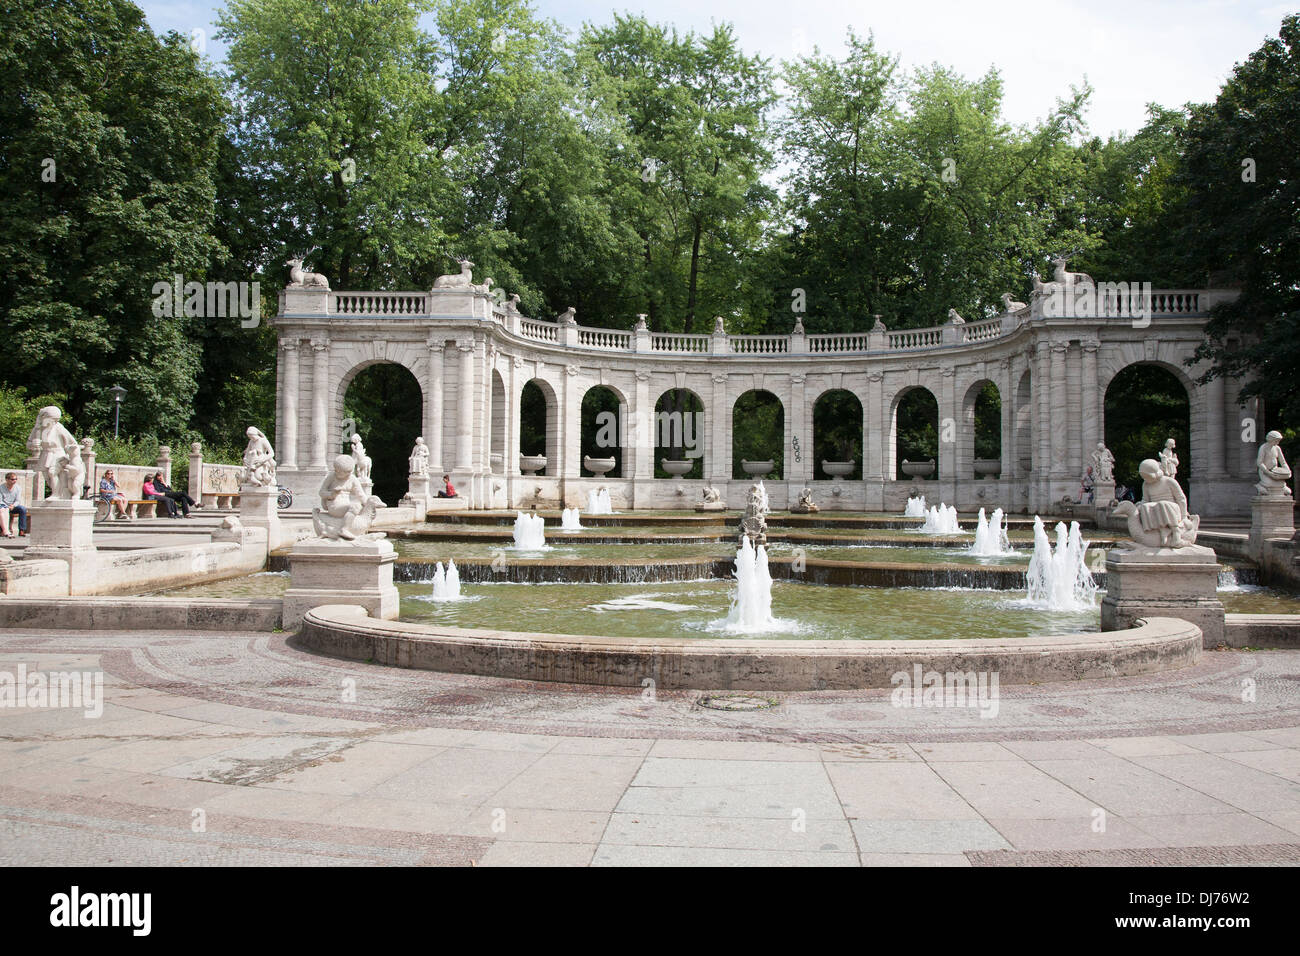 Marchenbrunnen Fairy Tale Fountain (1913) in the Volkspark Friedrichshain Park, Berlin, Germany - Stock Image